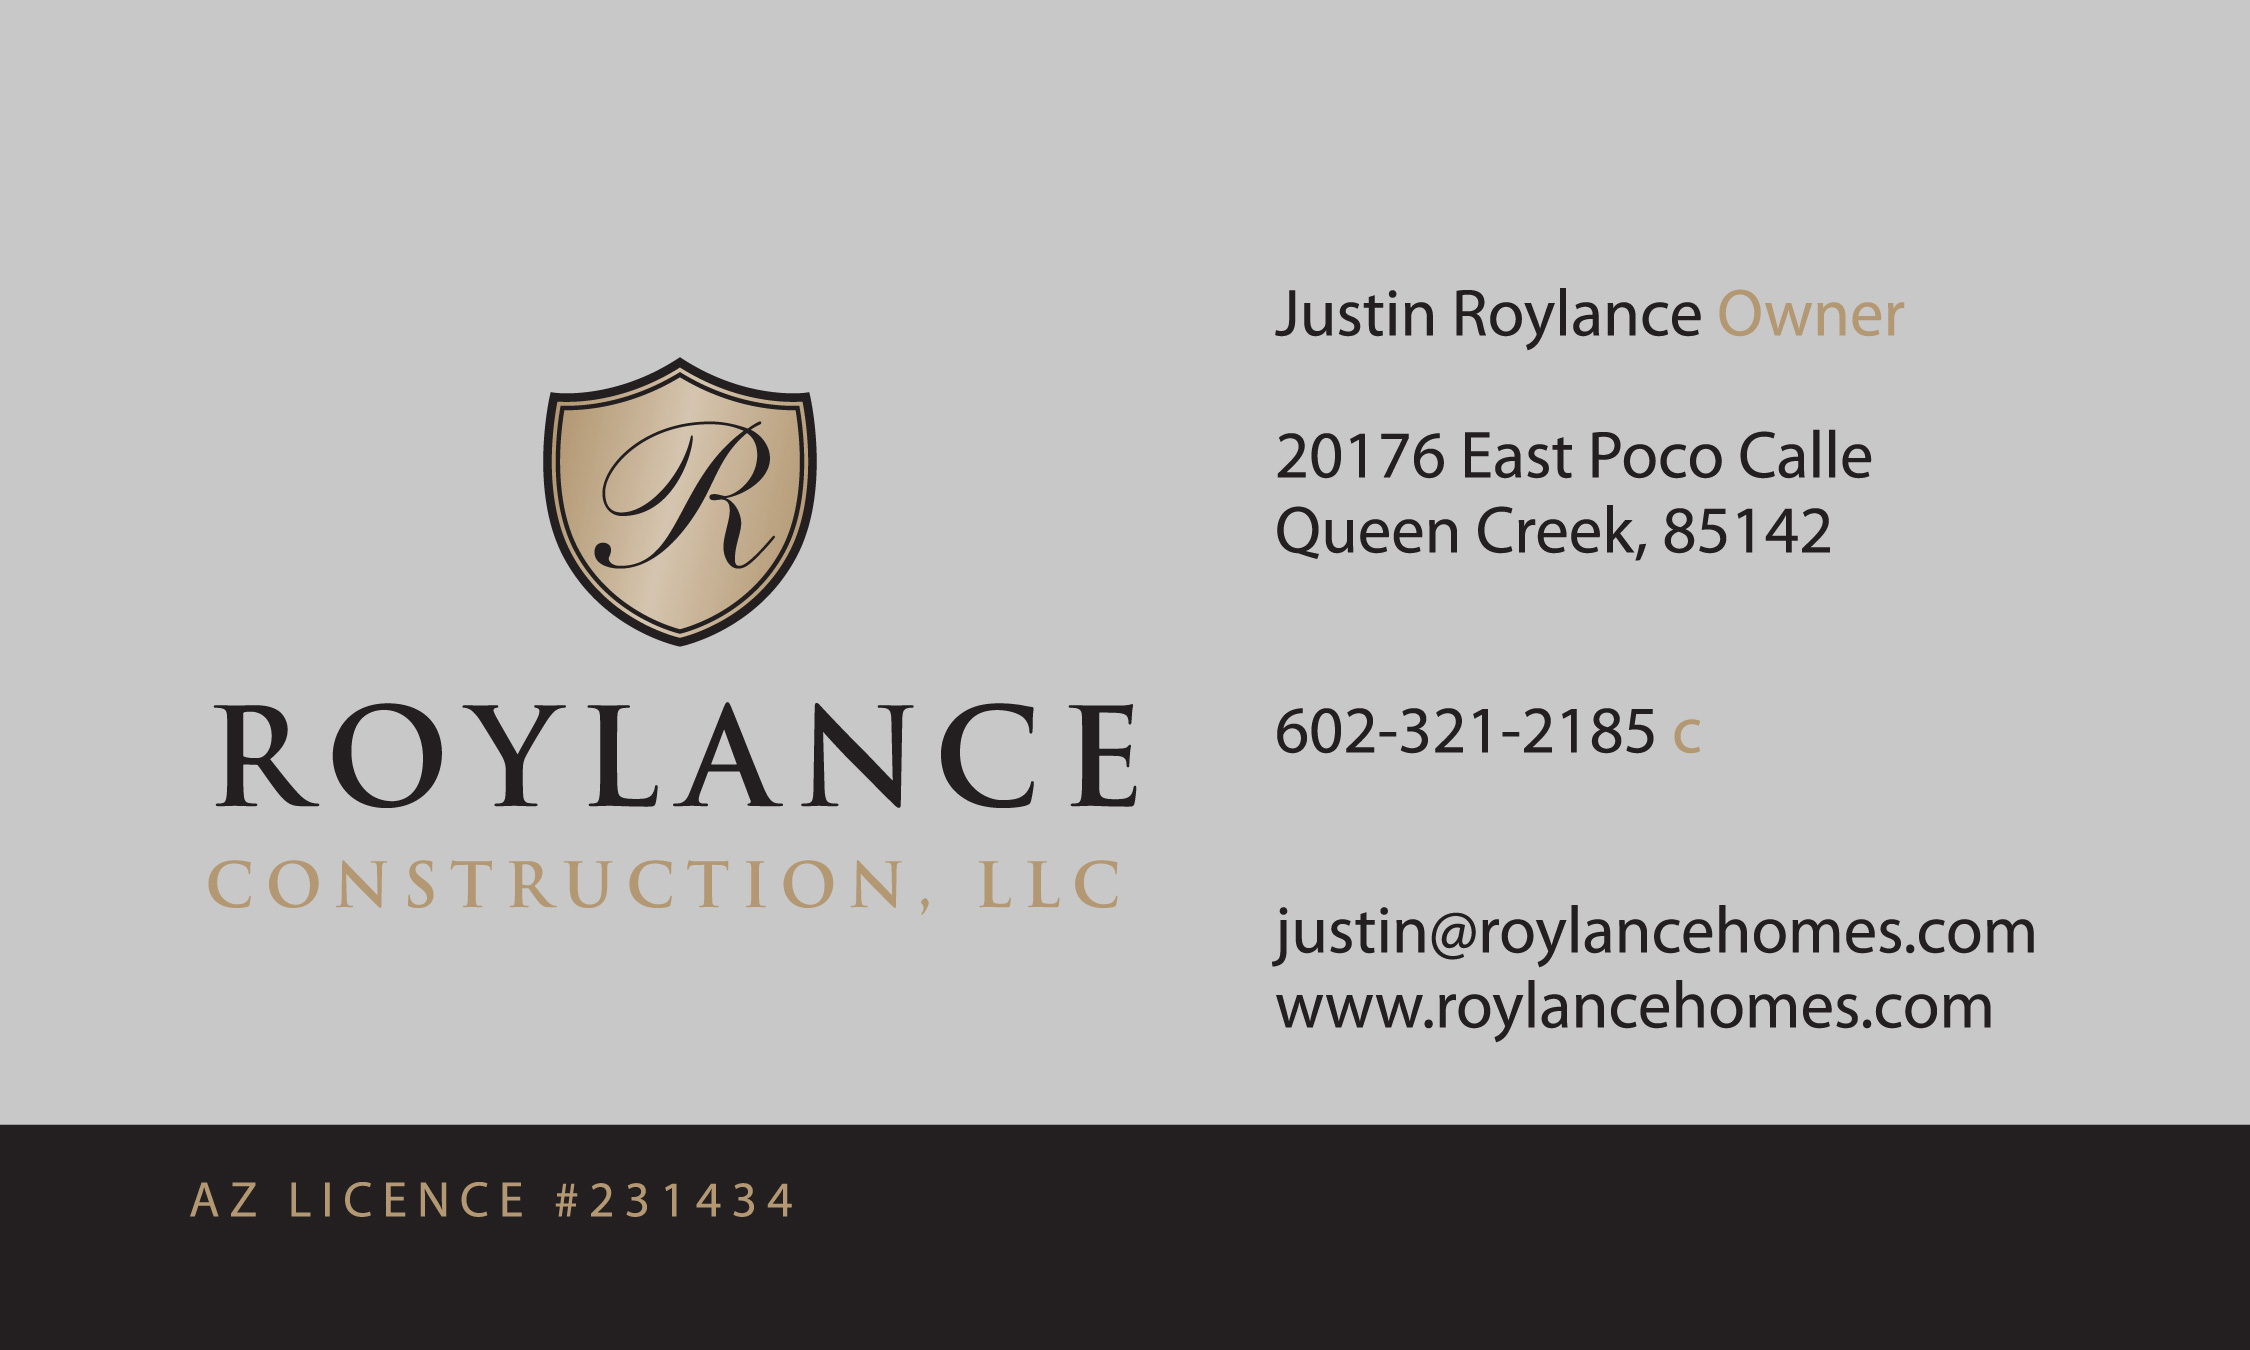 c_roylance